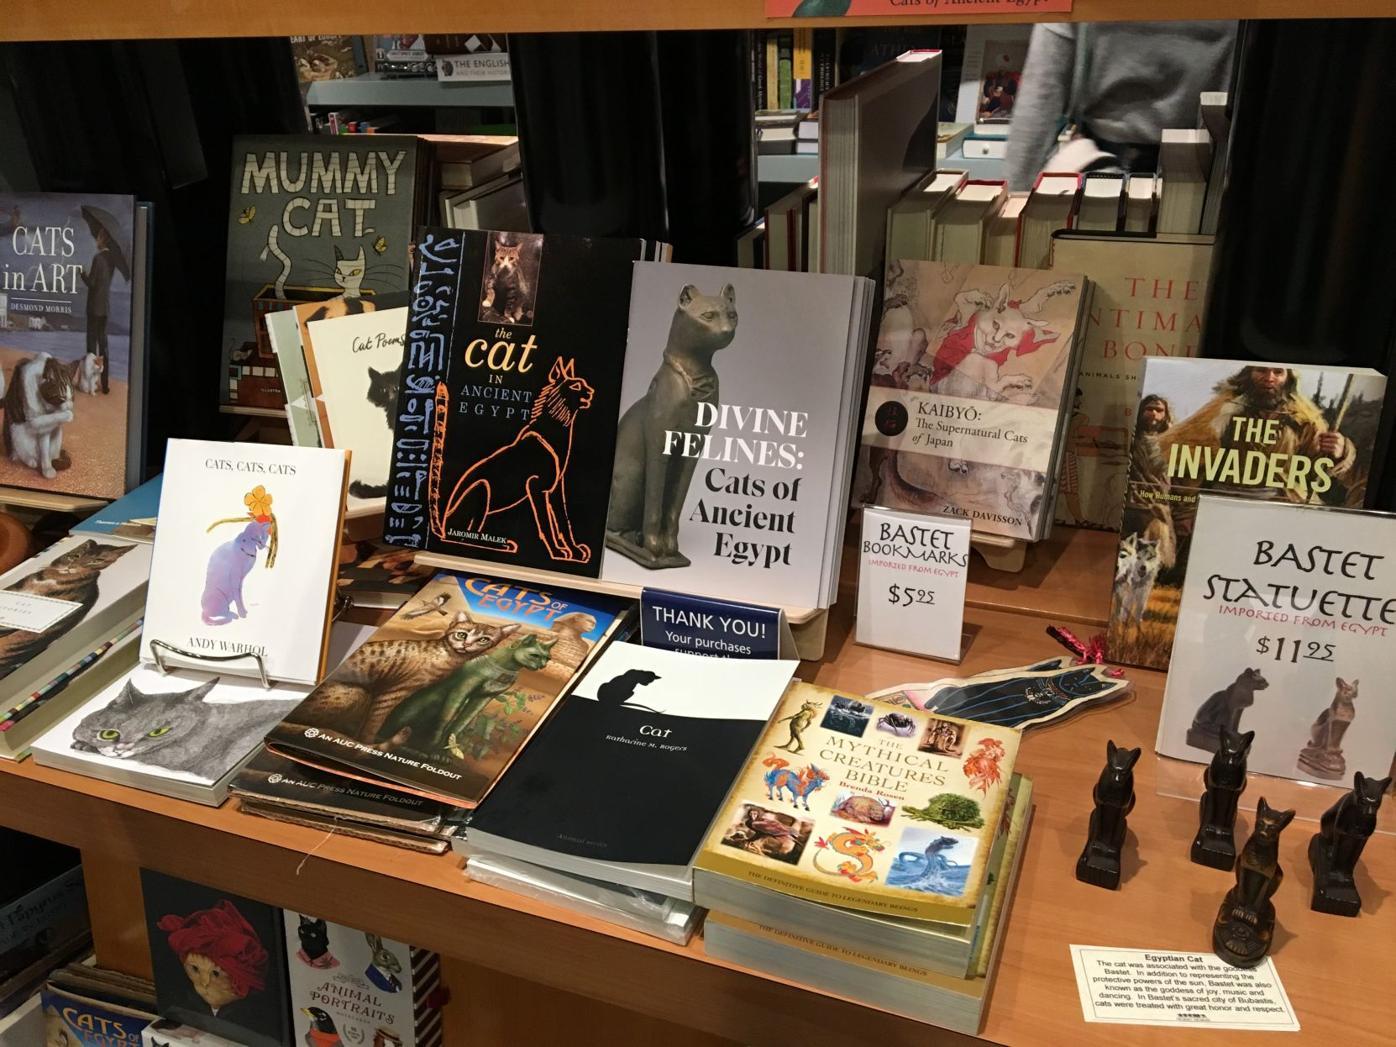 Carlos Museum bookshop display 01